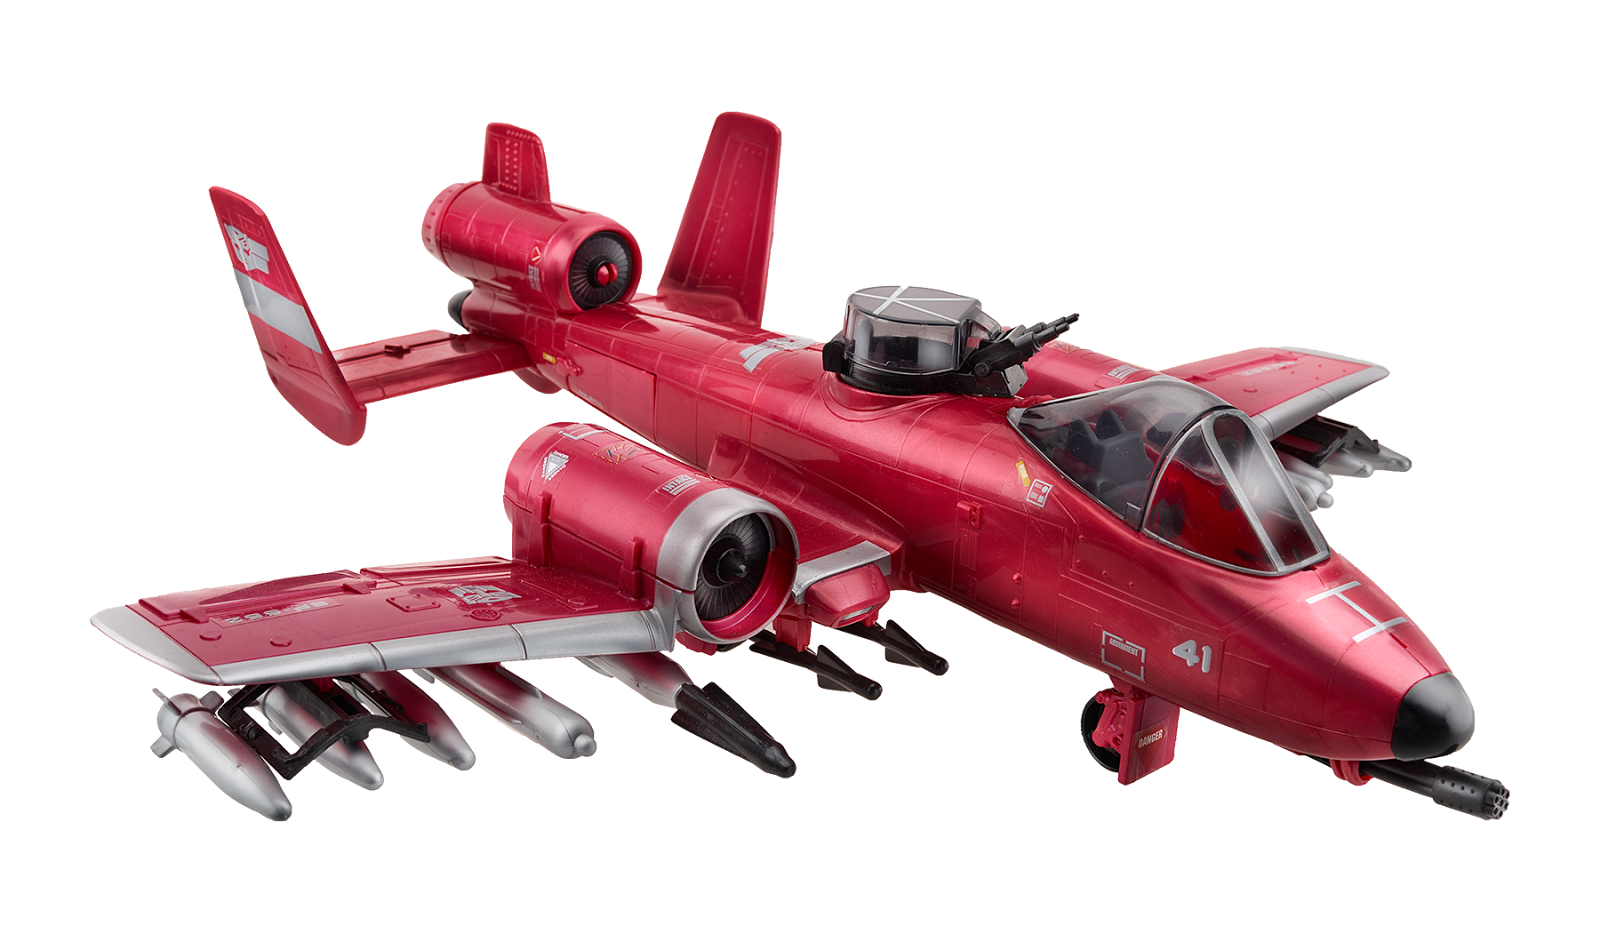 The Blot Says Sdcc 15 Exclusive G I Joe X Transformers Soundwave H I S S Tank Powerglide Rattler Box Set